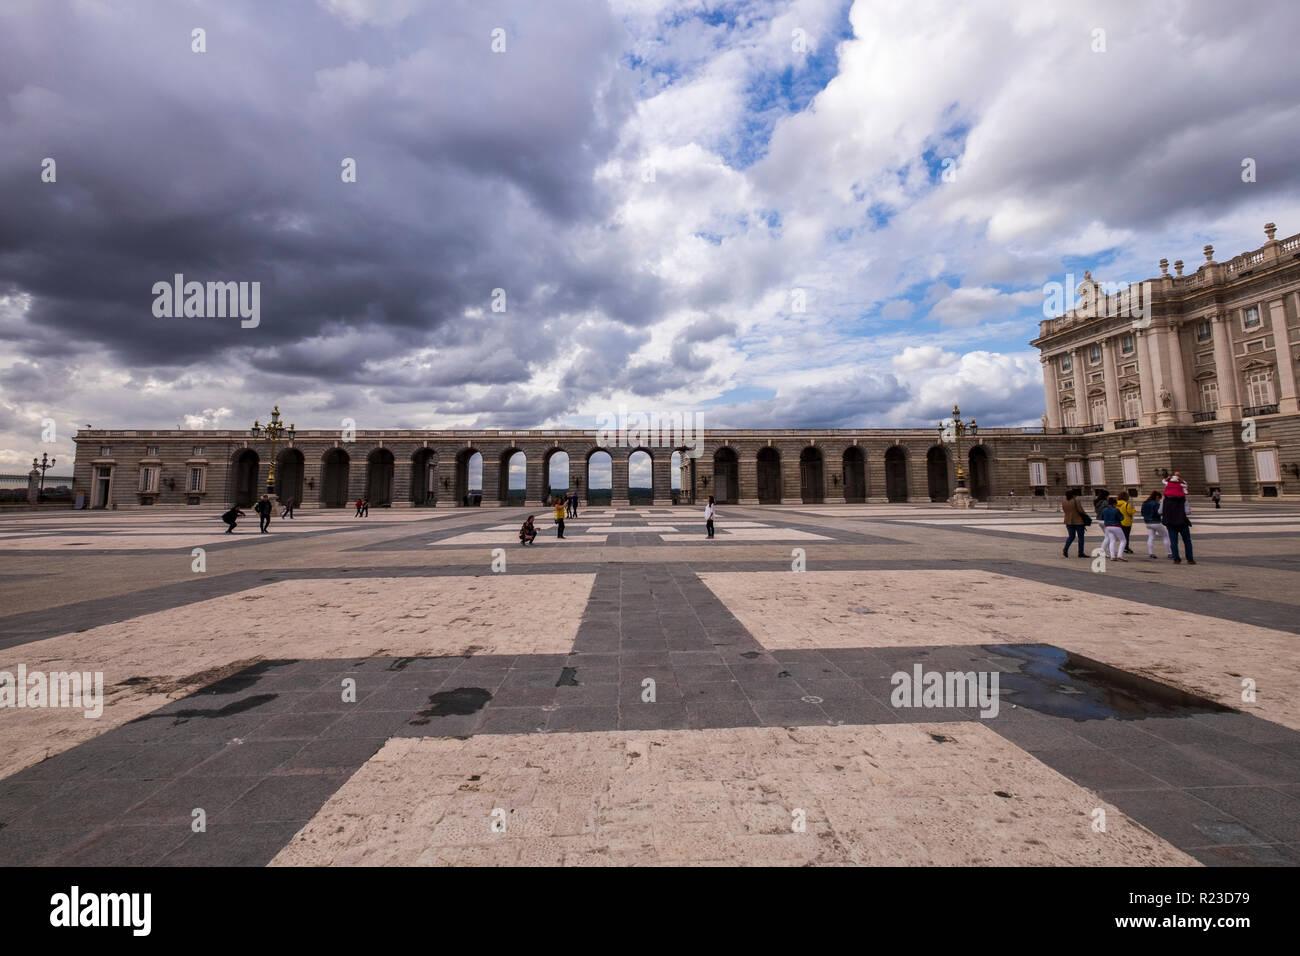 Courtyard and exterior views of the Royal palace, Palacio Real, in Madrid, Spain - Stock Image